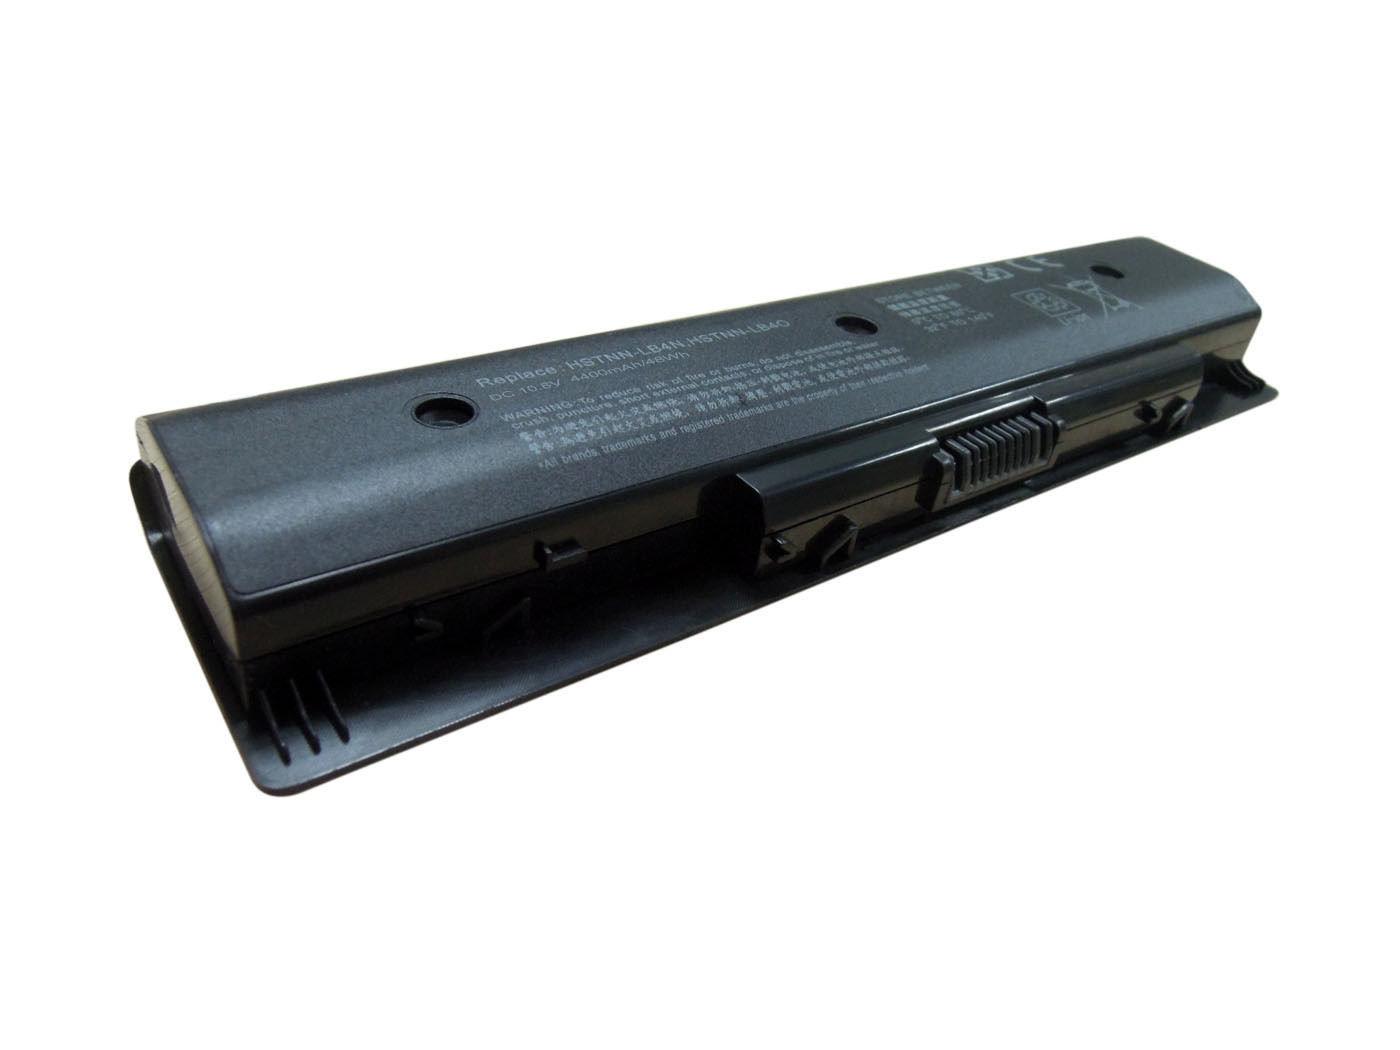 hp envy touchsmart 14, touchsmart 15  P106  PI06  PI06XL  PI09 HSTNN-LB4N HSTNN-LB4O HSTNN-YB4N  HSTNN-YB4O  P106  PI06  PI06XL Compatible laptop battery